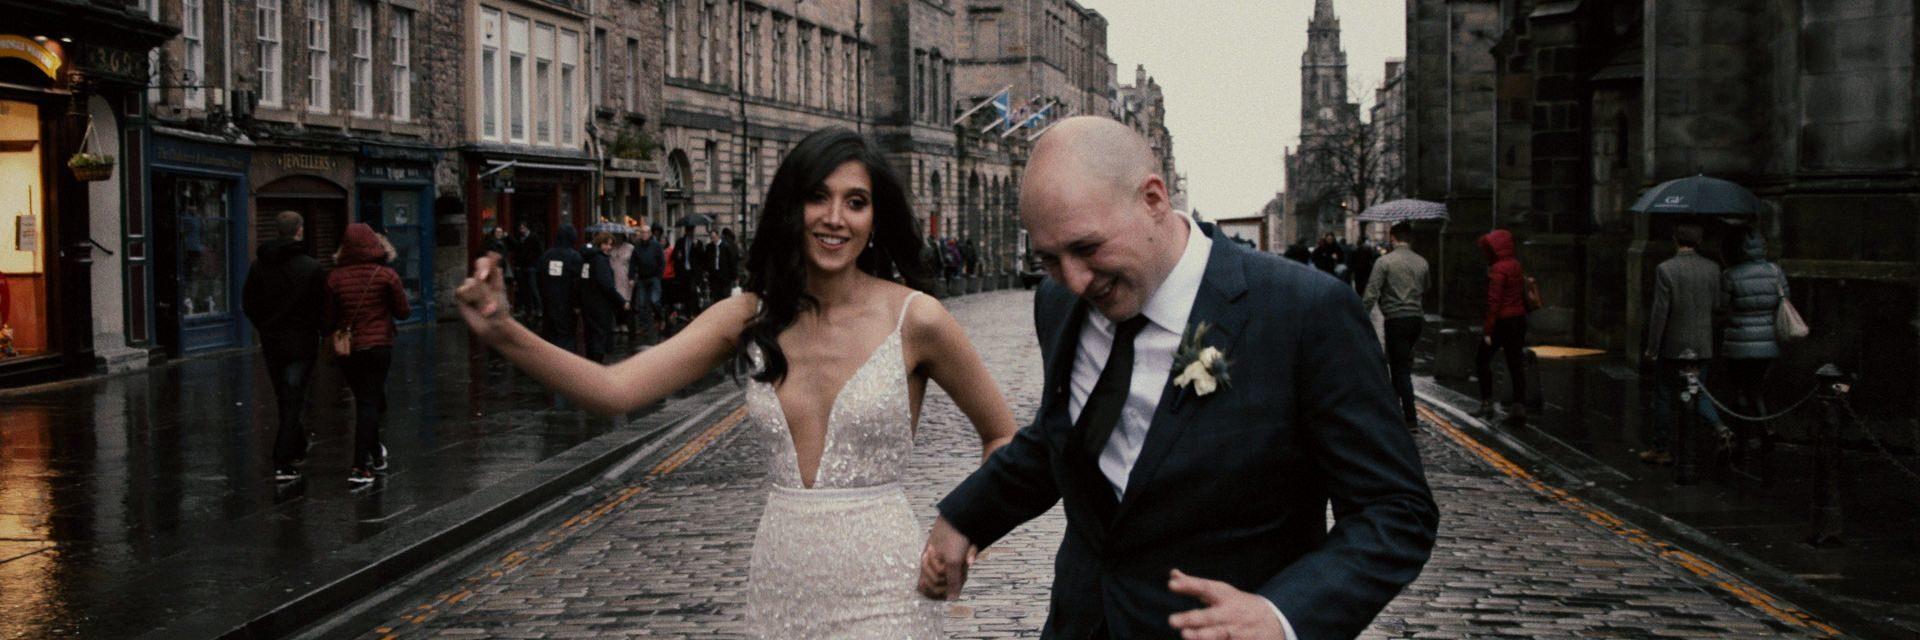 Faro-wedding-videographer-cinemate-films-04